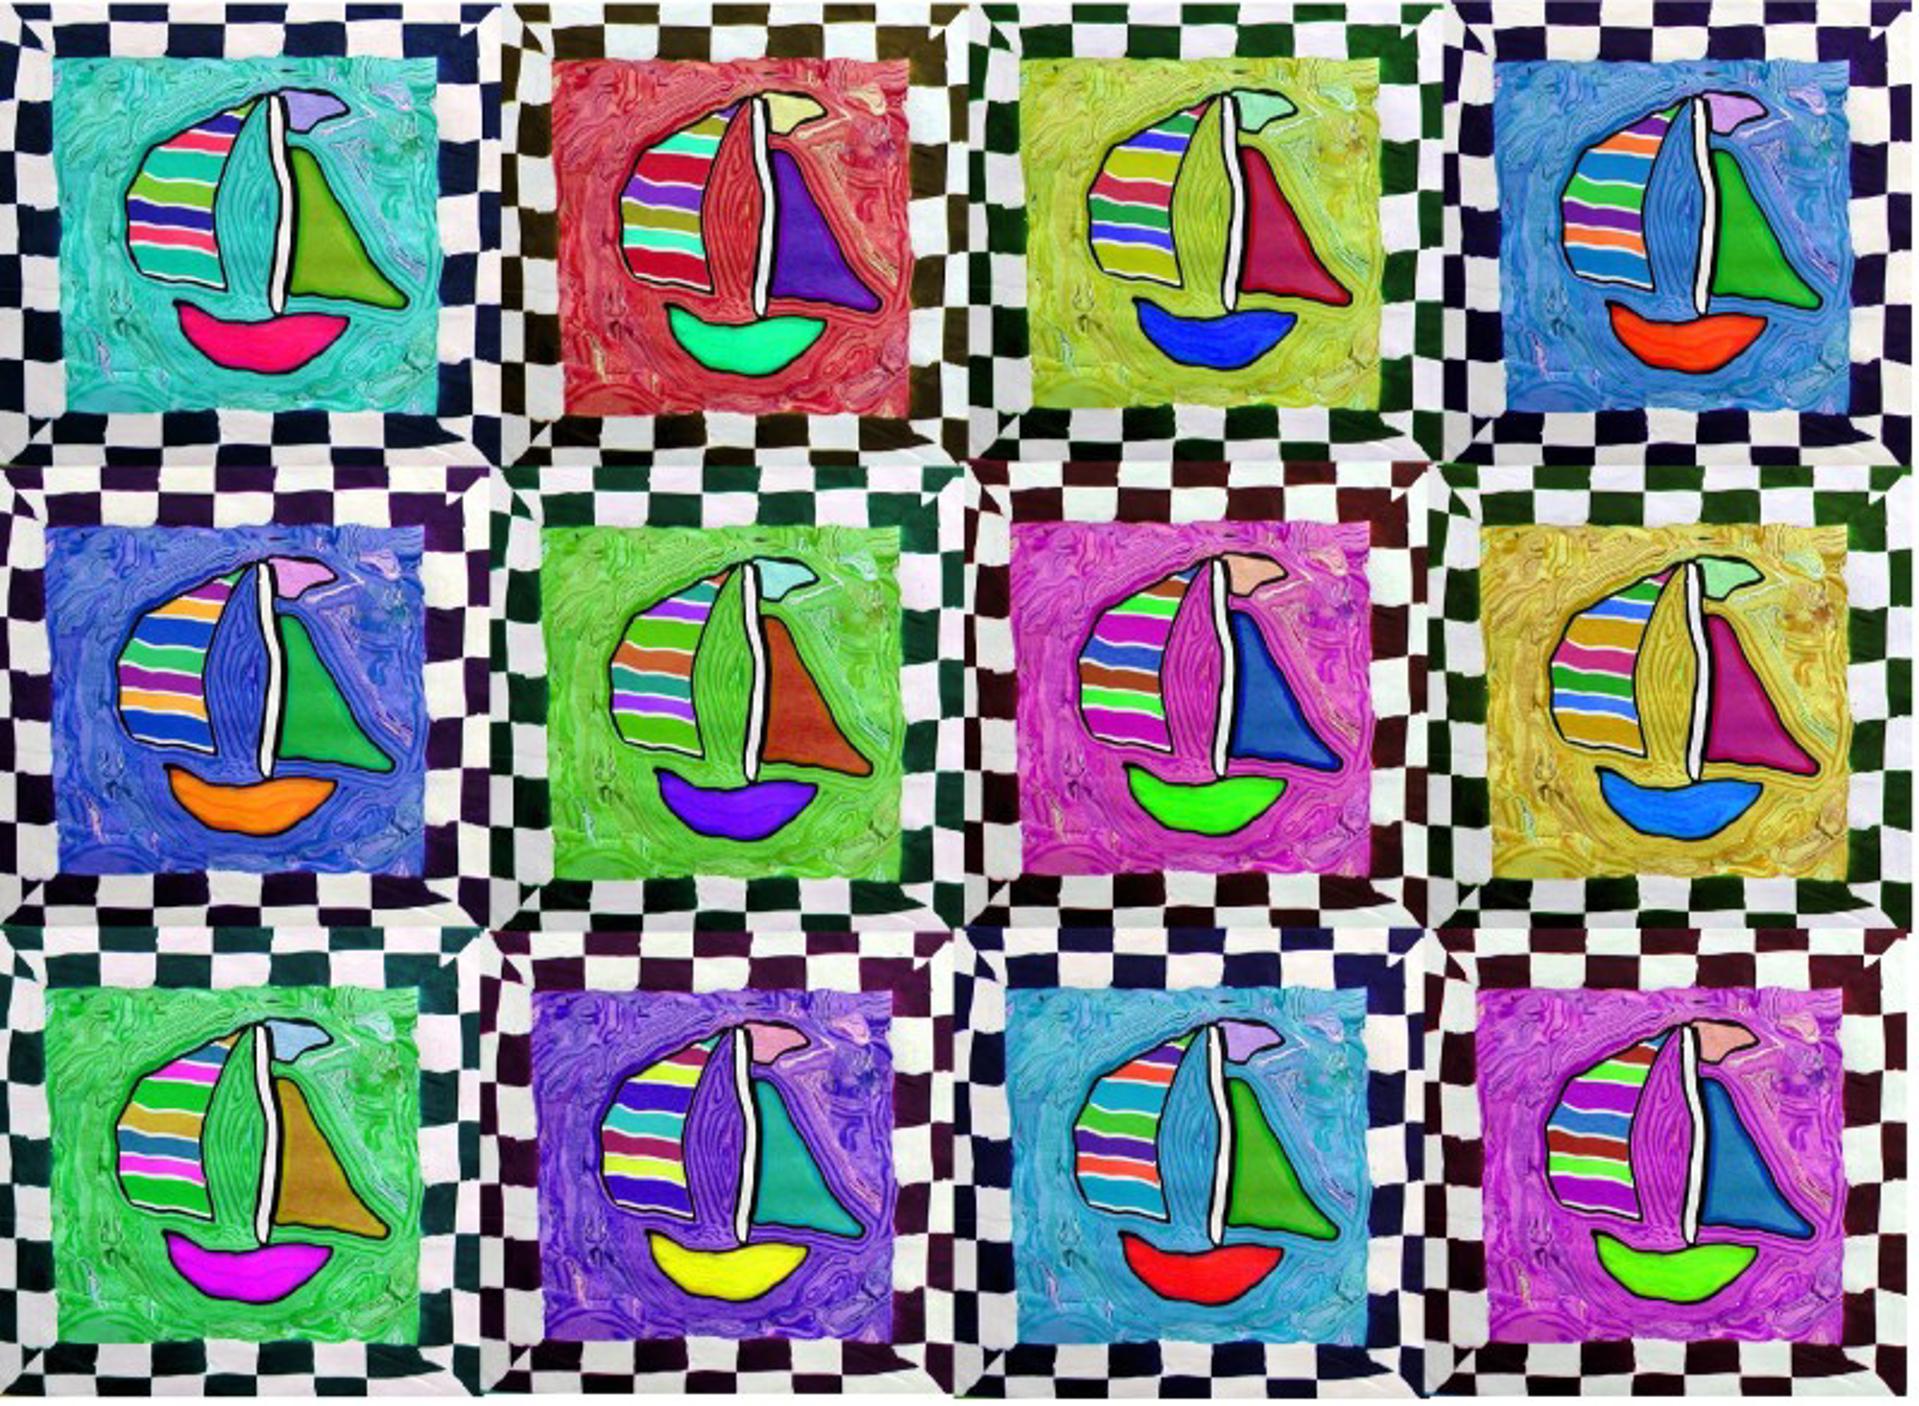 Twelve sailboats by Samantha Long - Prints